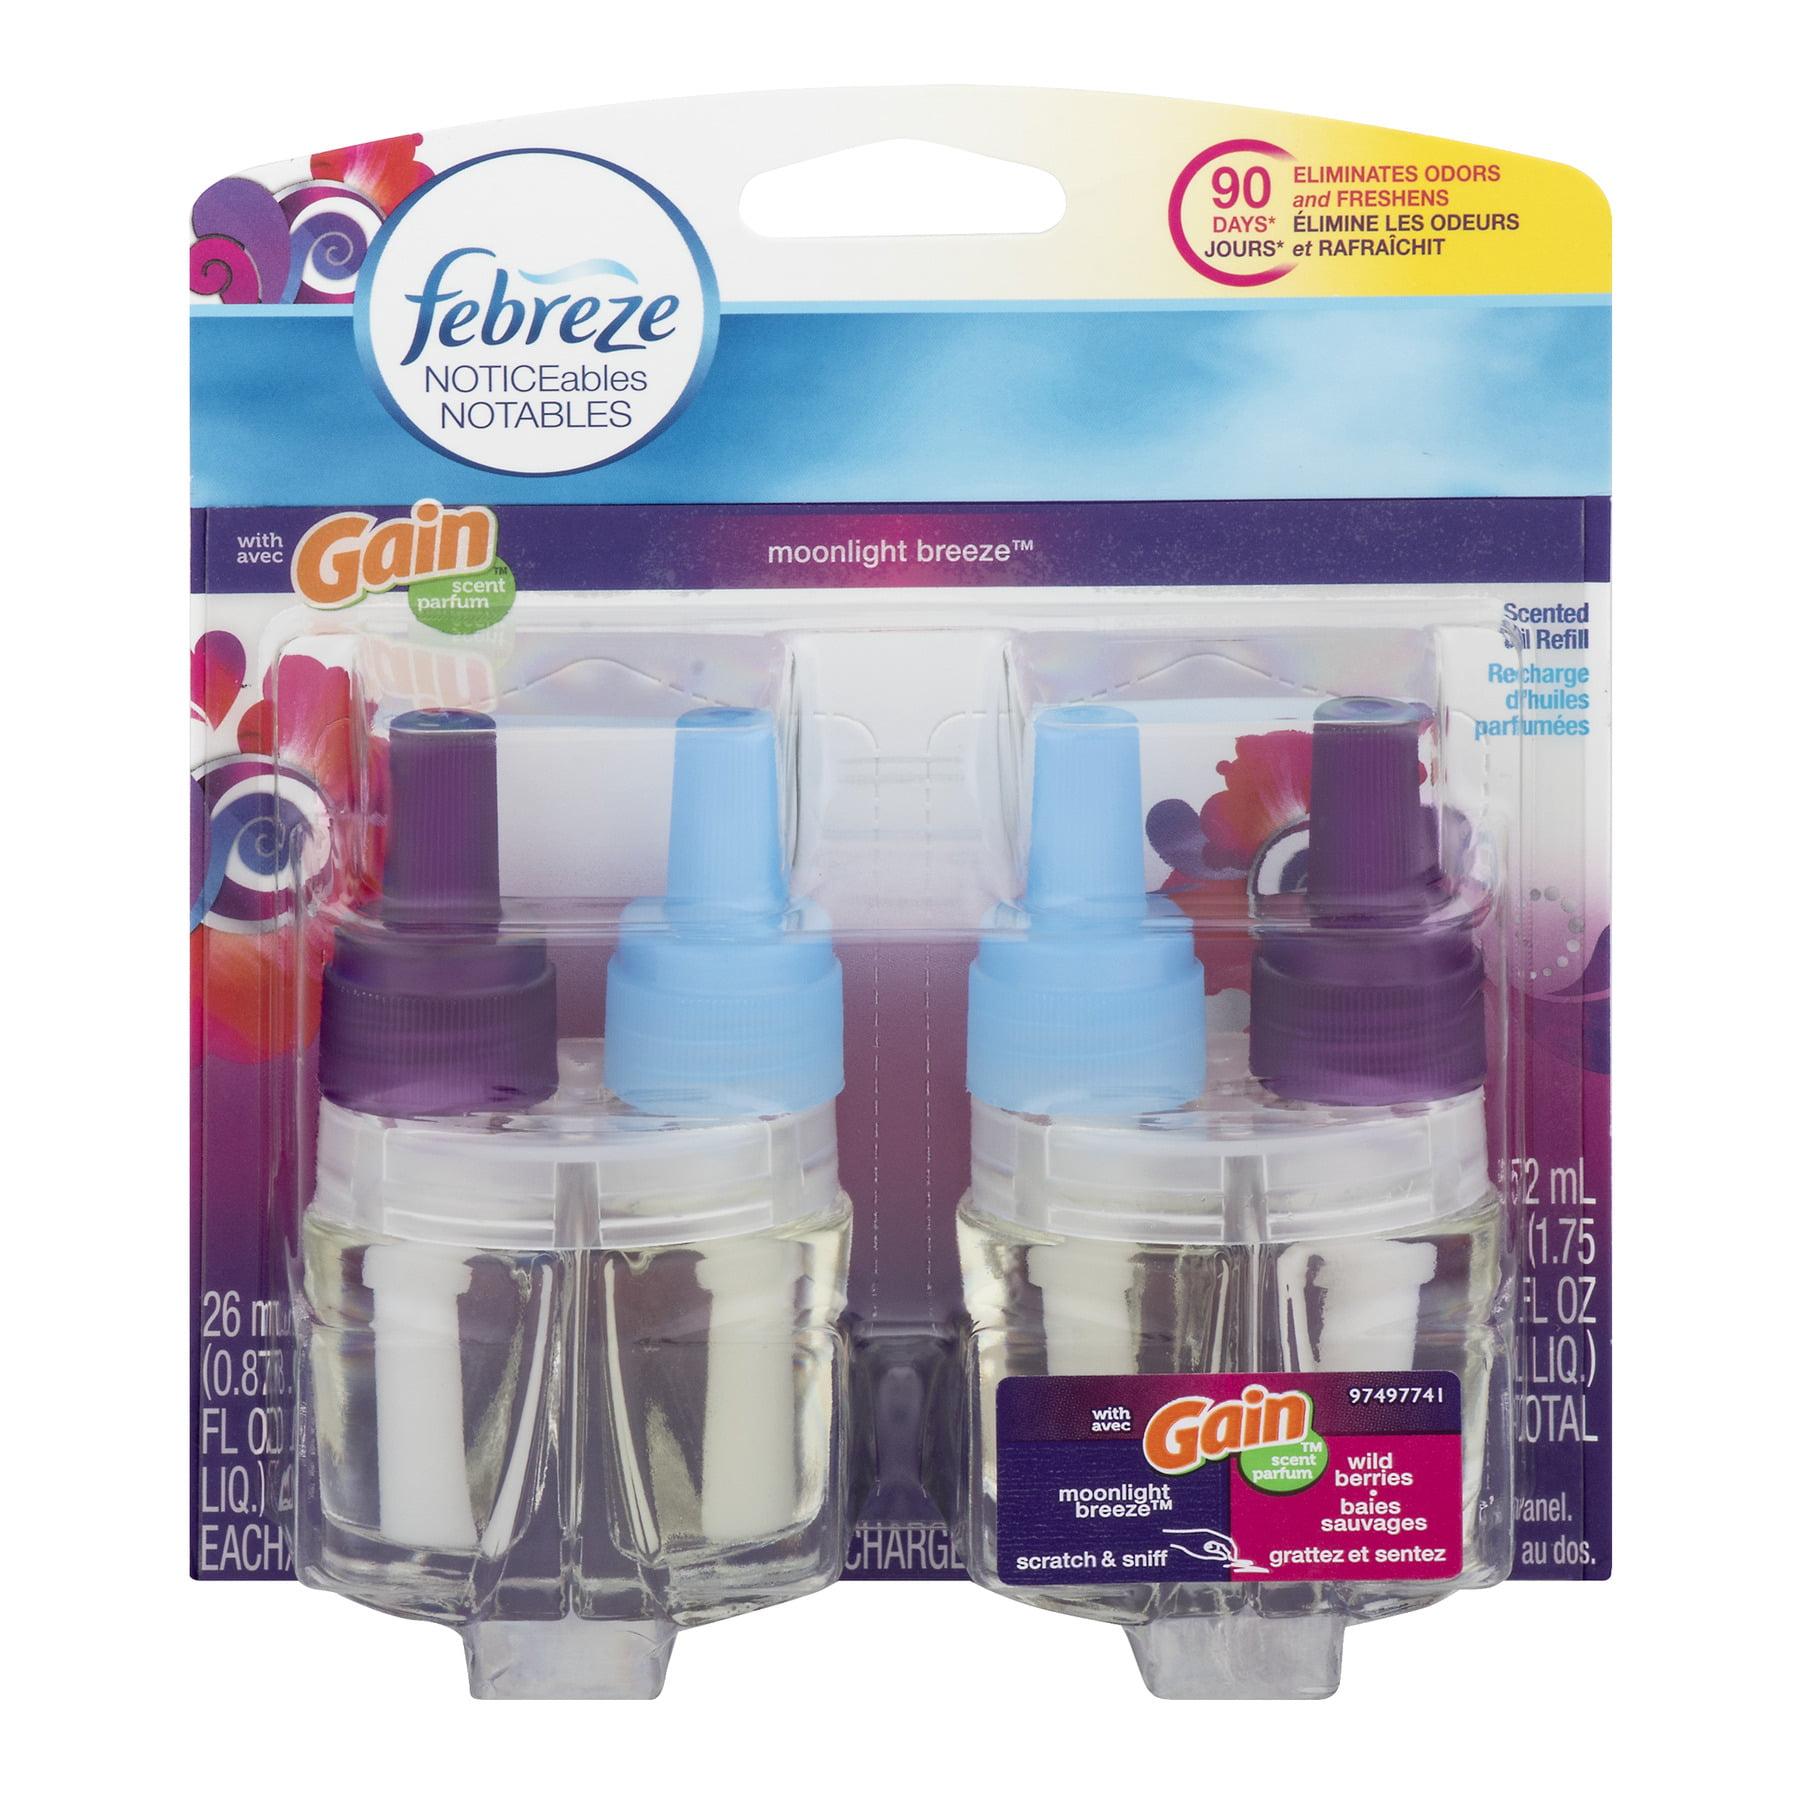 Febreze Noticeables Air Freshener Refills, with Gain Moonlight Breeze 0.87 fl. oz. (Pack of 2)